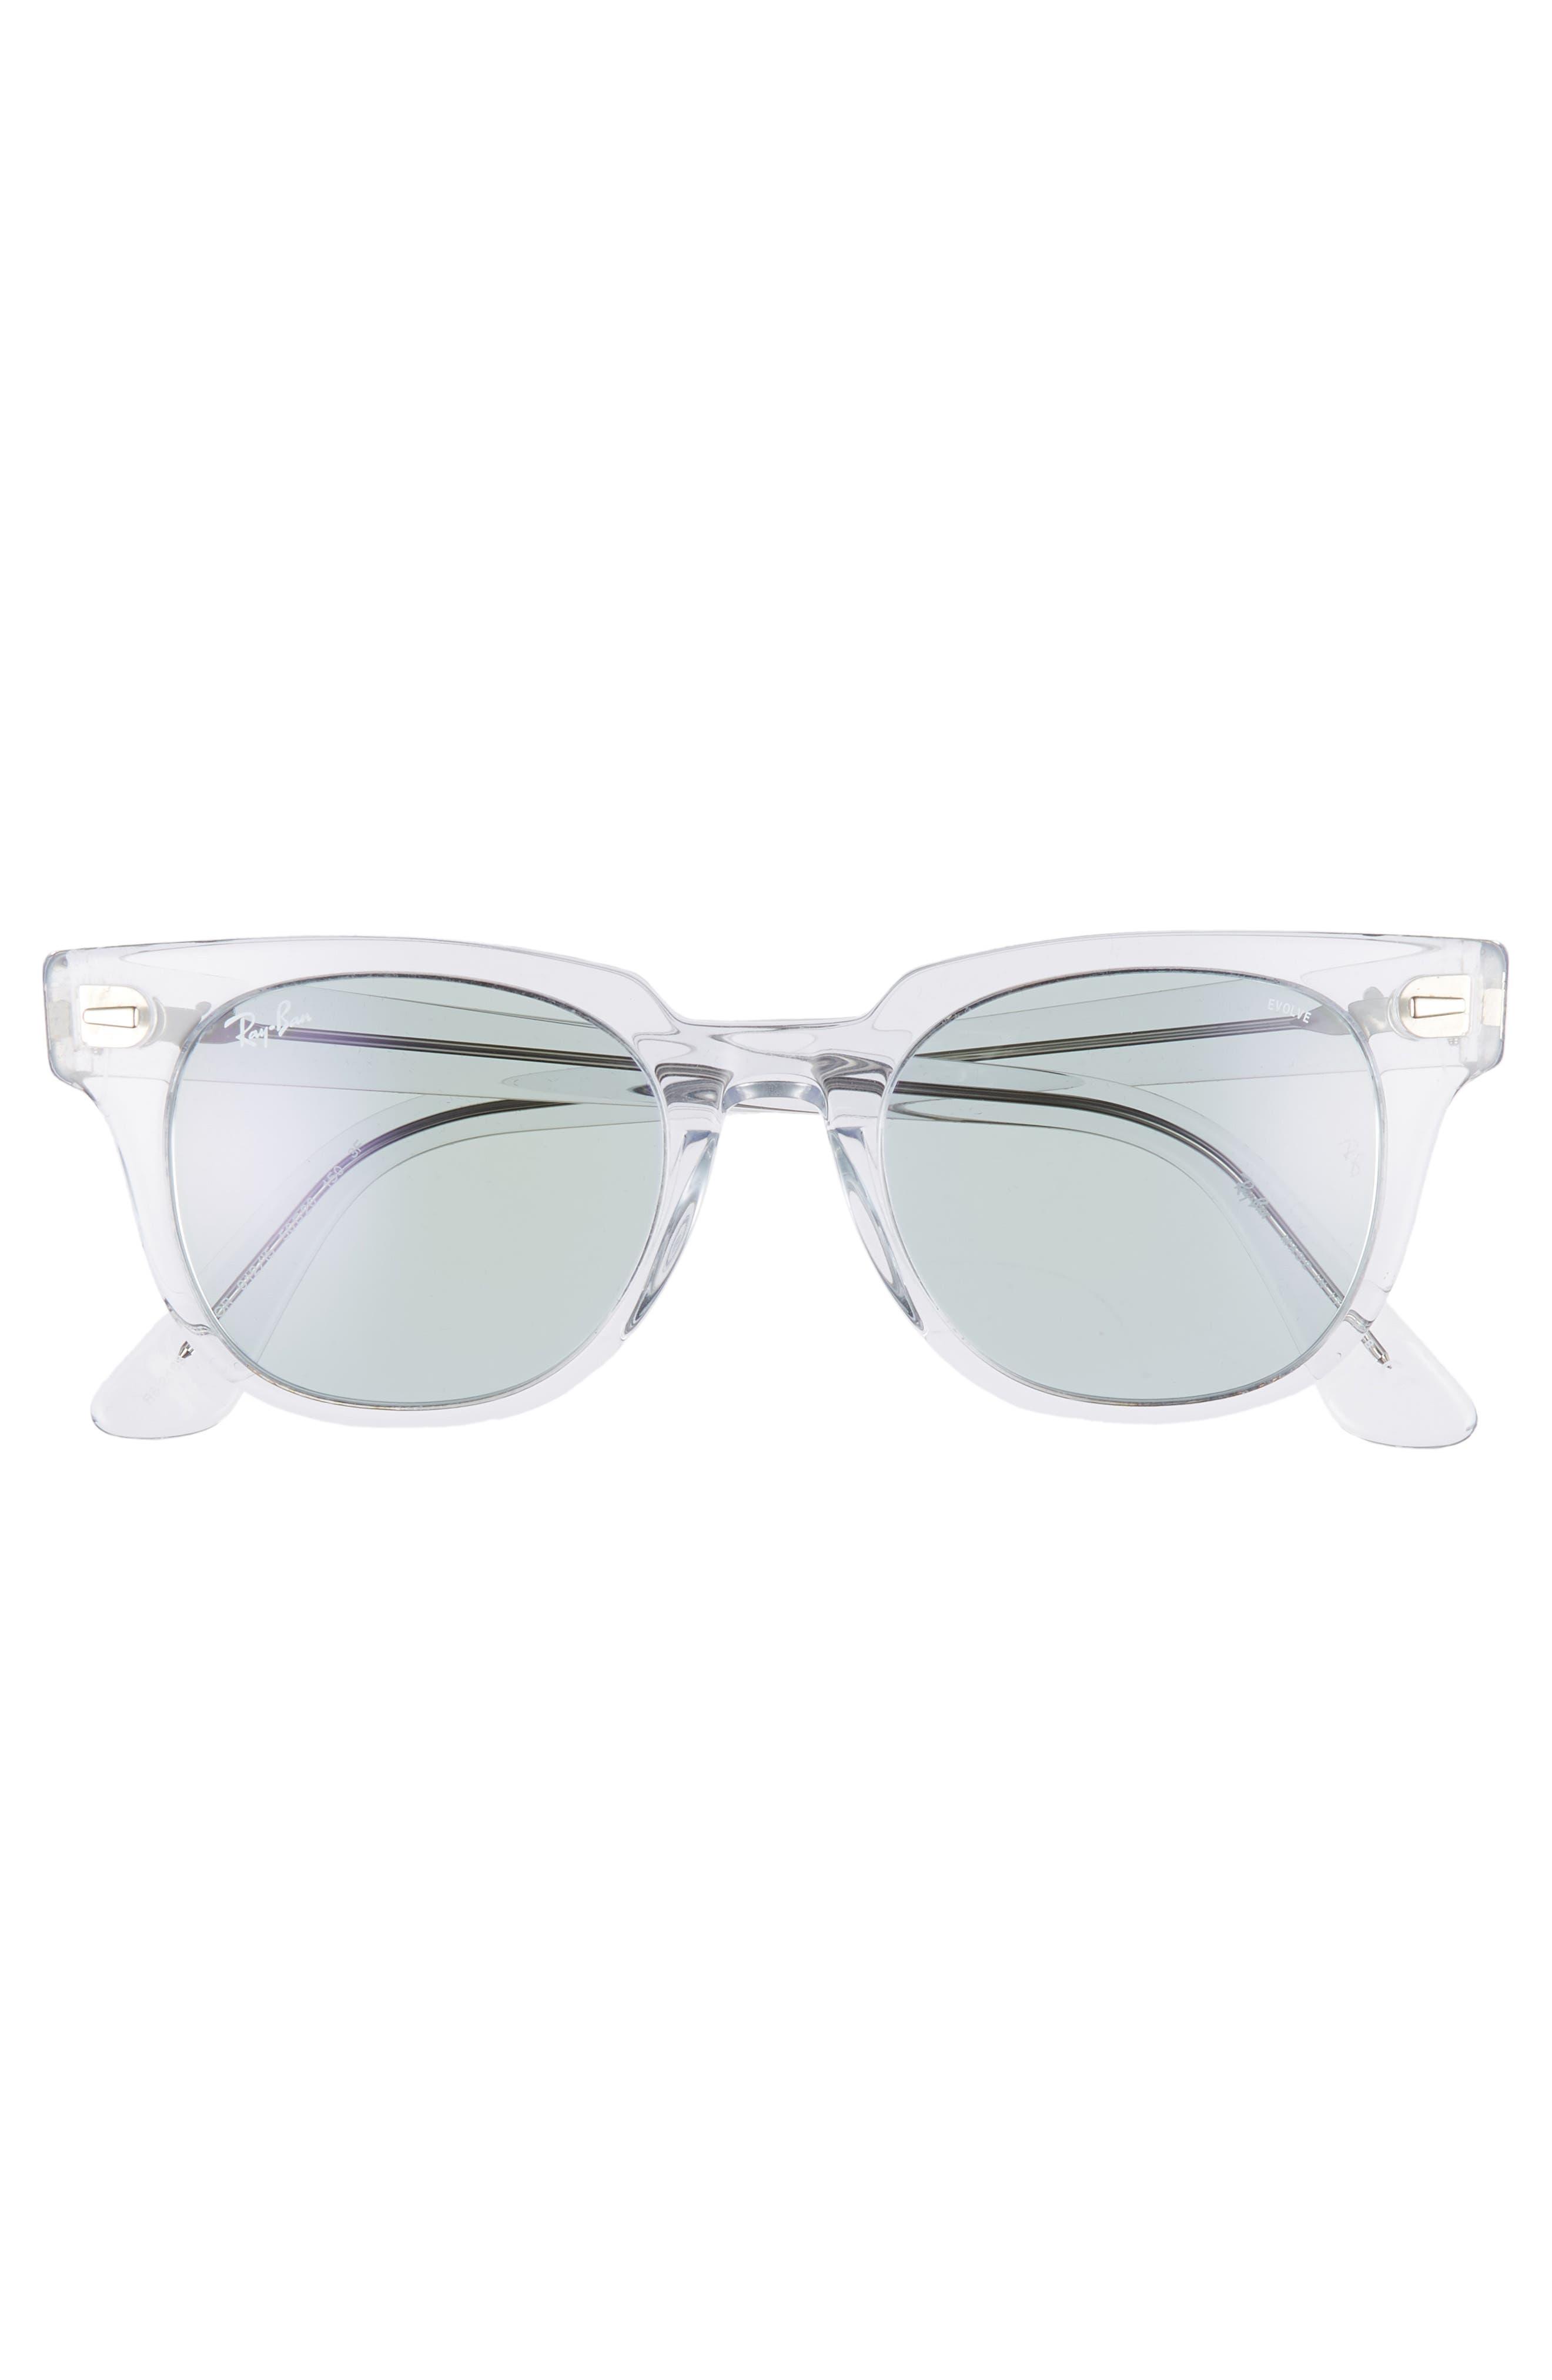 RAY-BAN, Meteor 50mm Wayfarer Photochromic Sunglasses, Alternate thumbnail 3, color, CRYSTAL/ BLUE SOLID